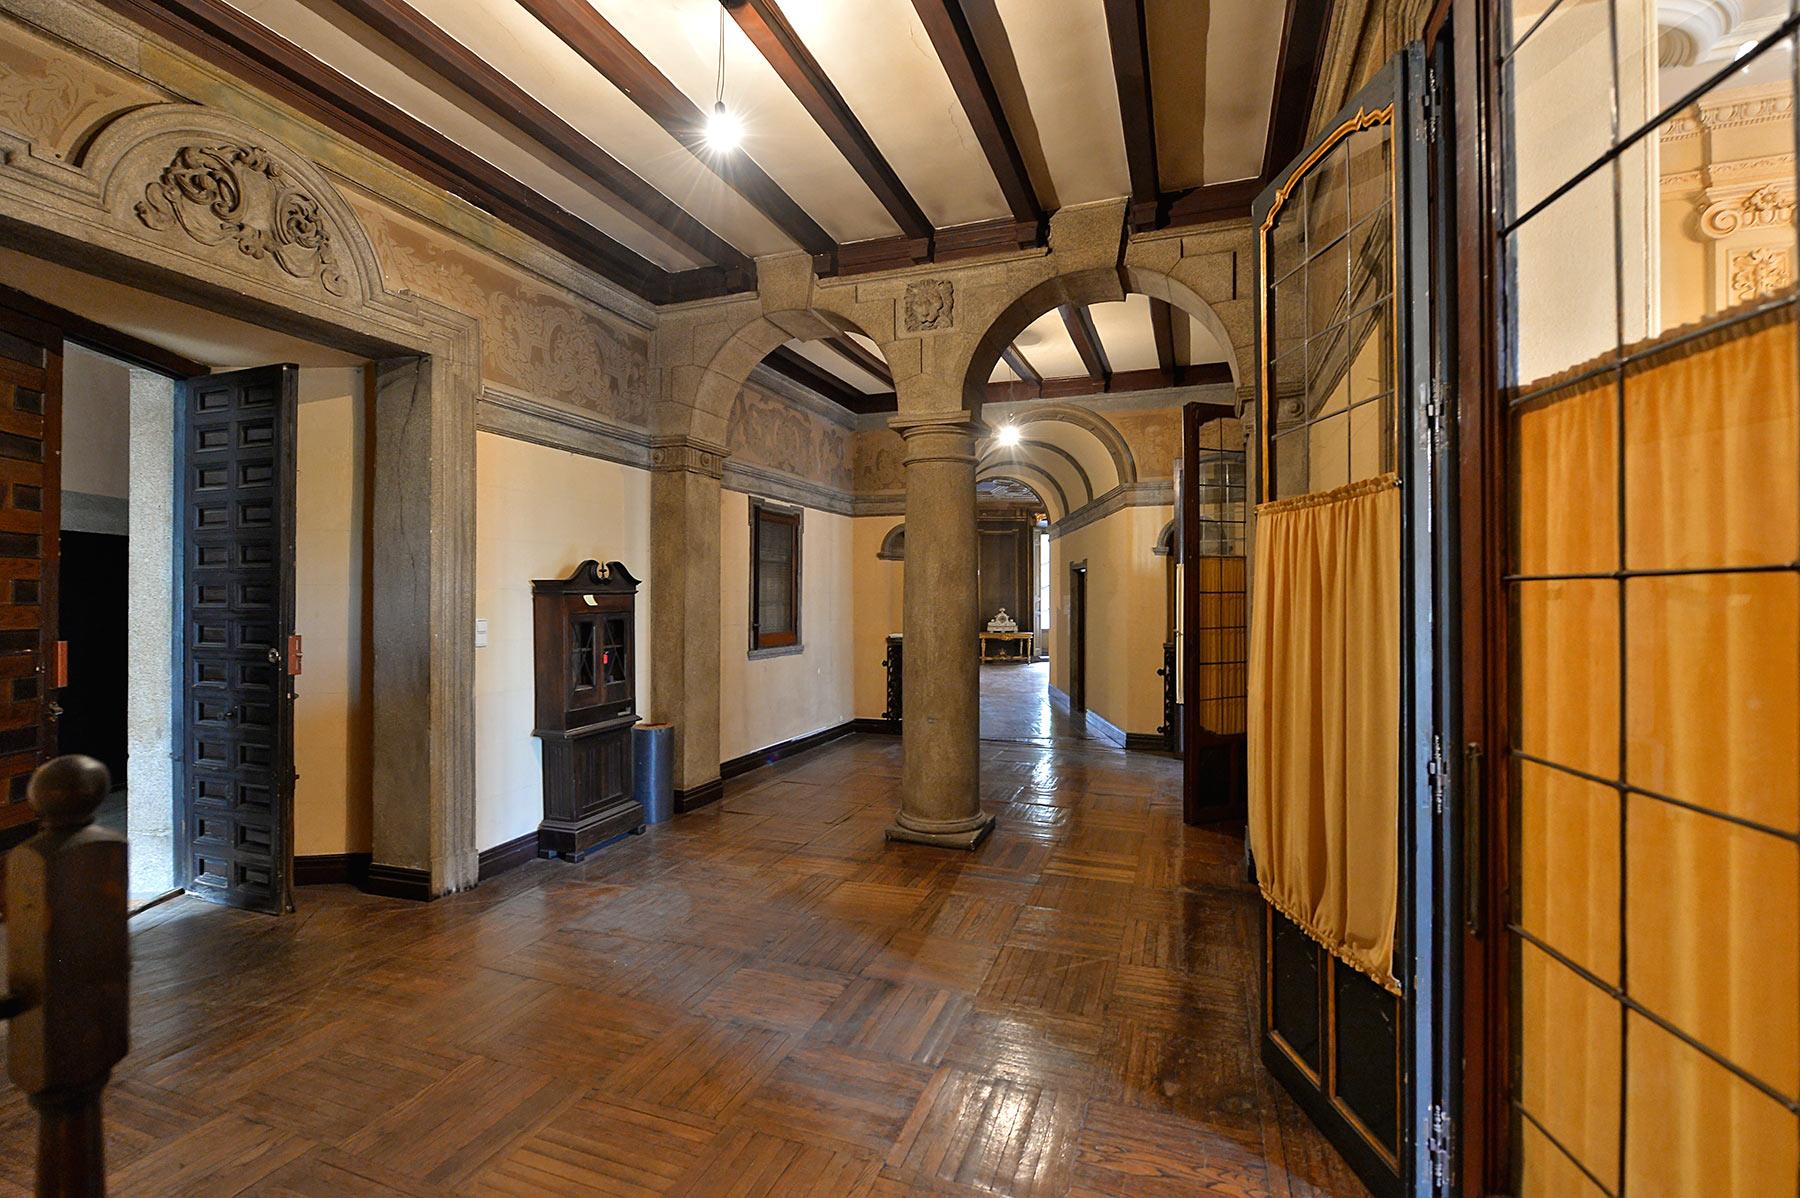 Apartment for Sale in Palacio, Madrid - Centro